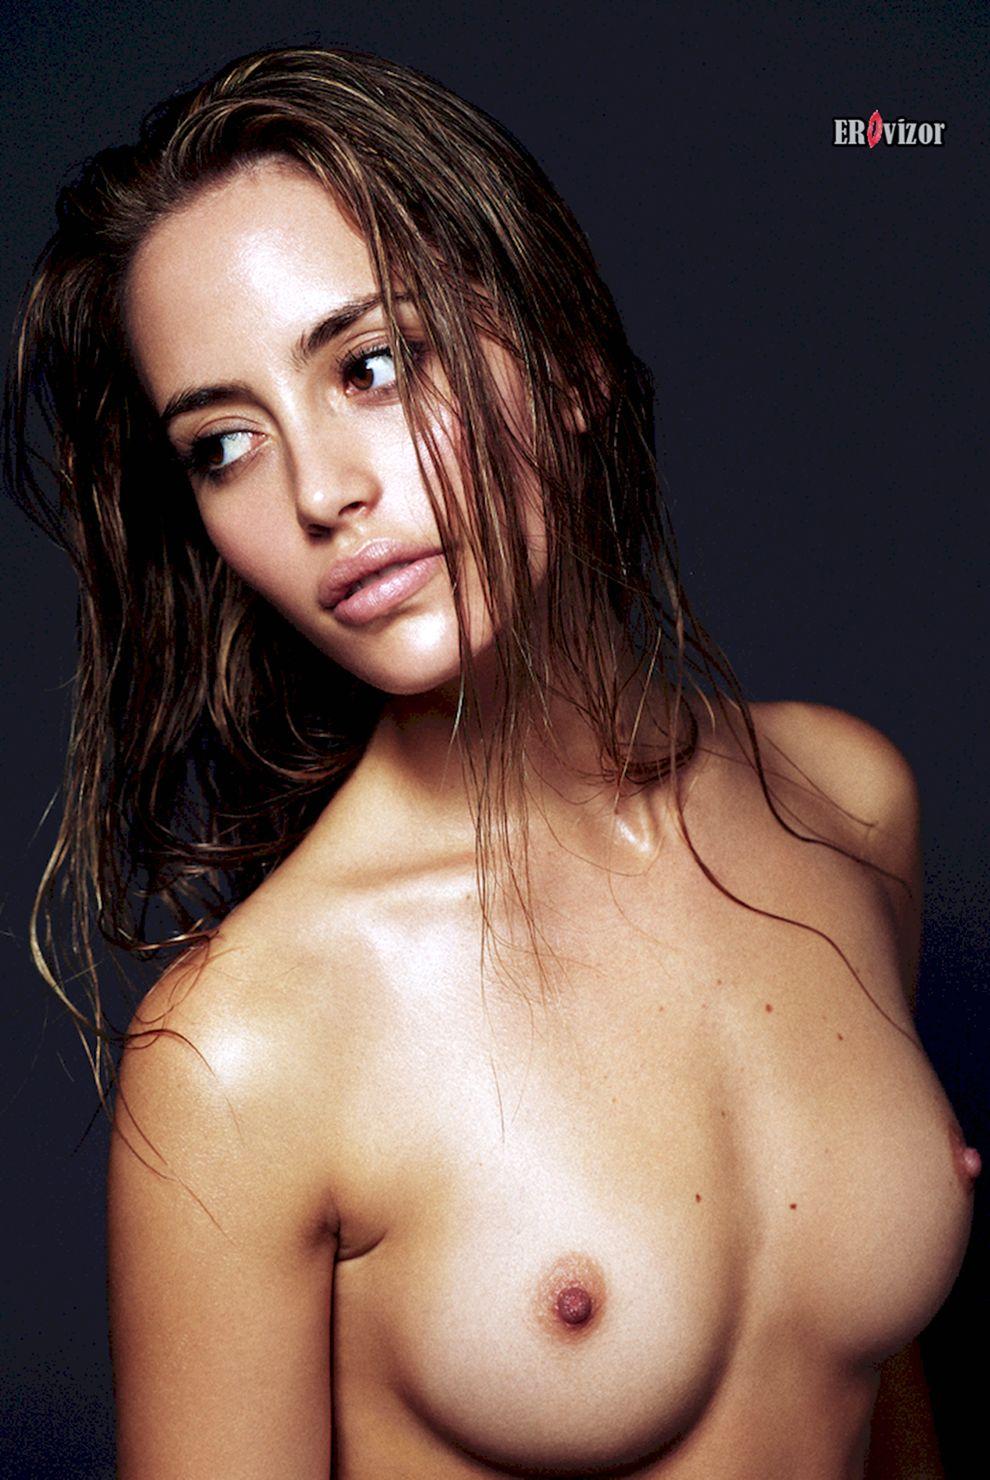 legkaya_erotica-erovizor (34)